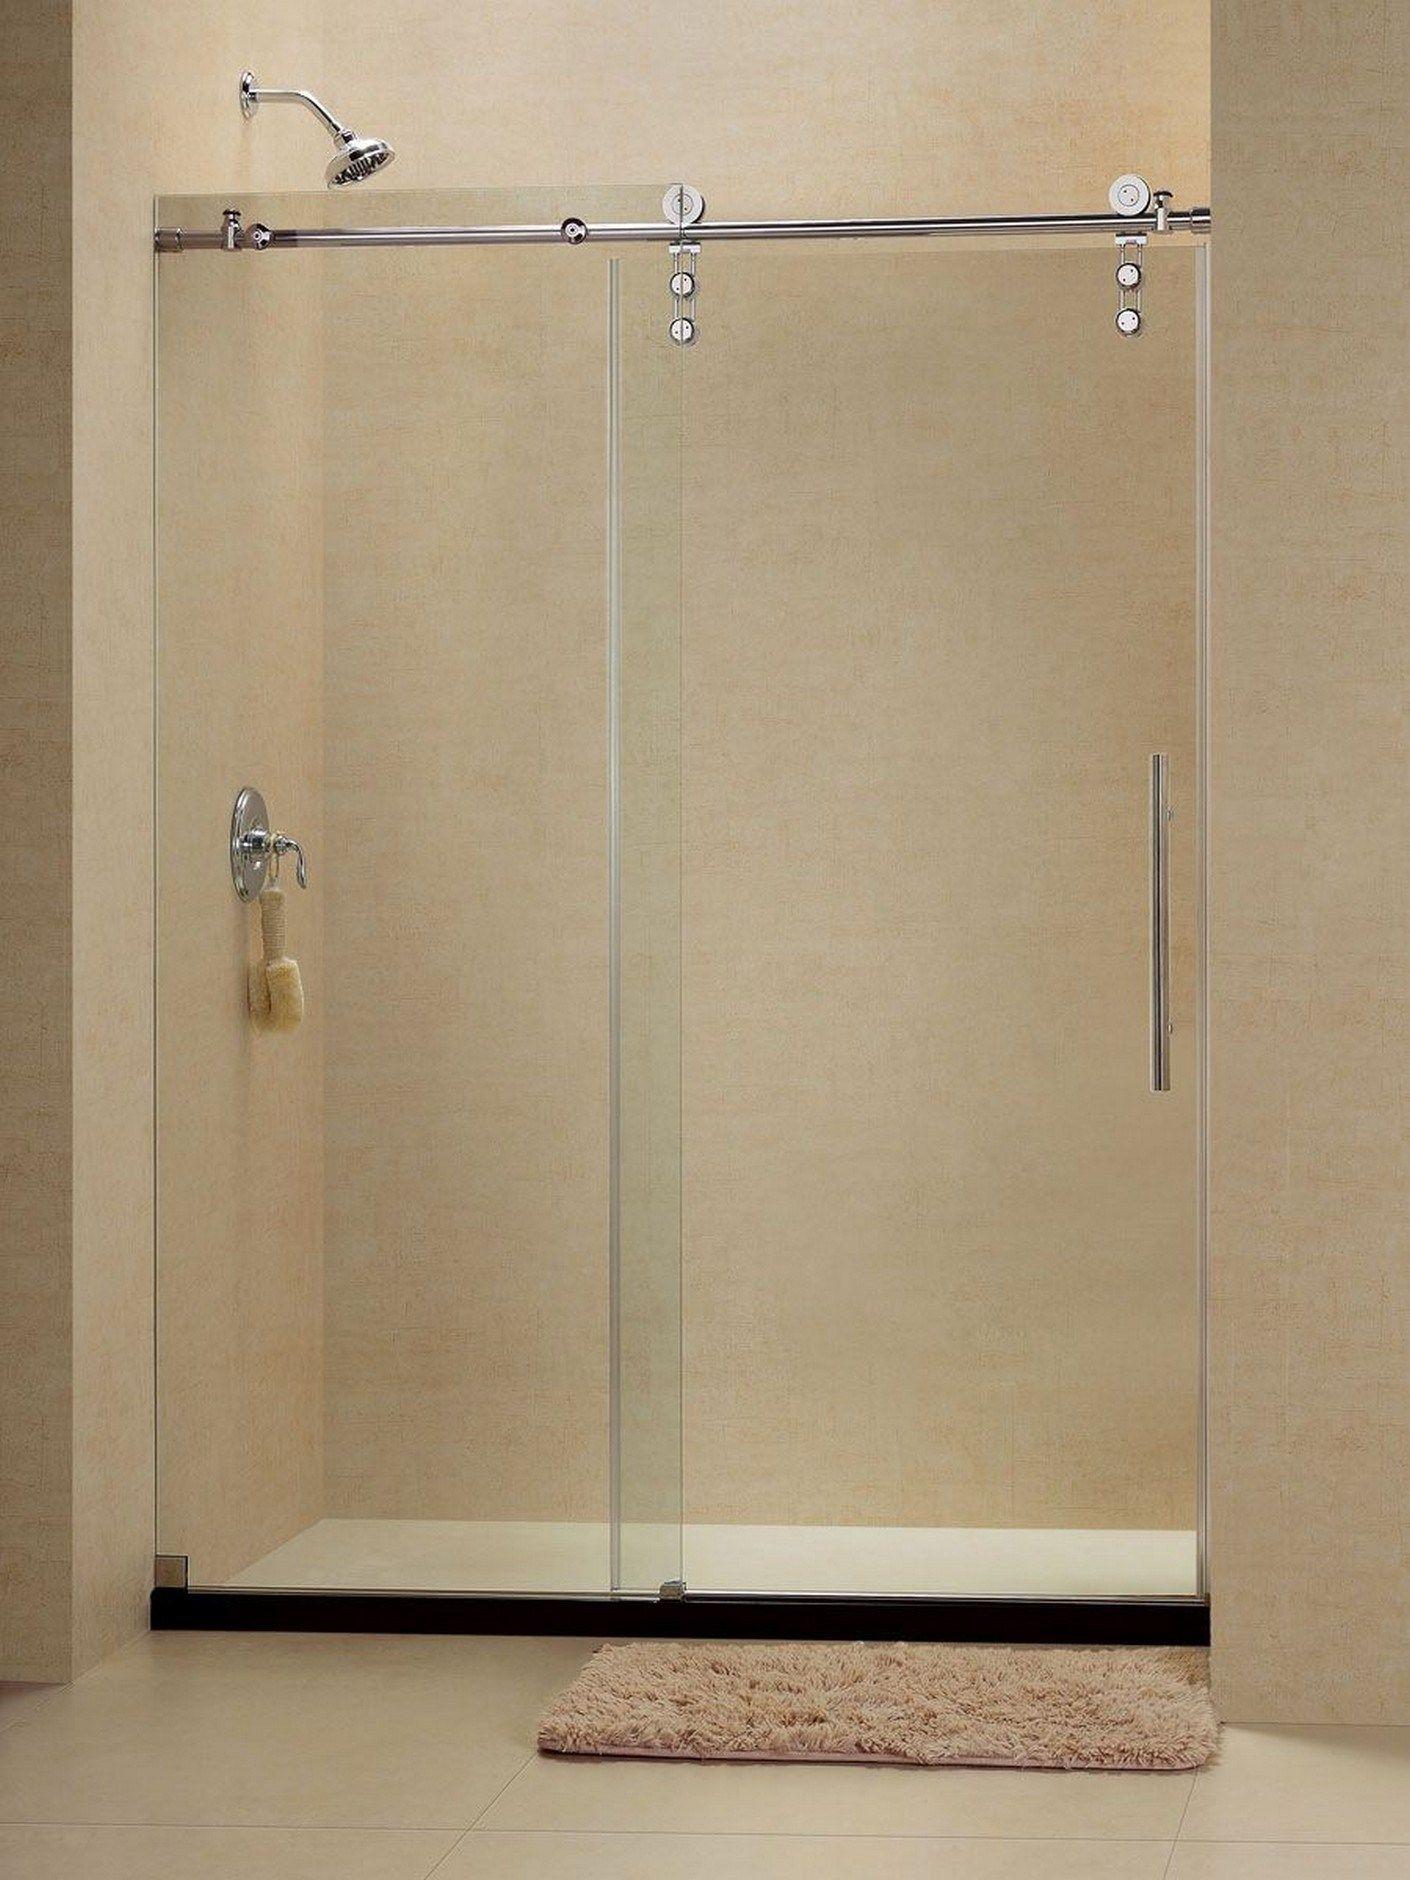 68 Open Entry Shower Design Featuring Dreamline In 2020 Shower Doors Sliding Shower Door Frameless Sliding Shower Doors